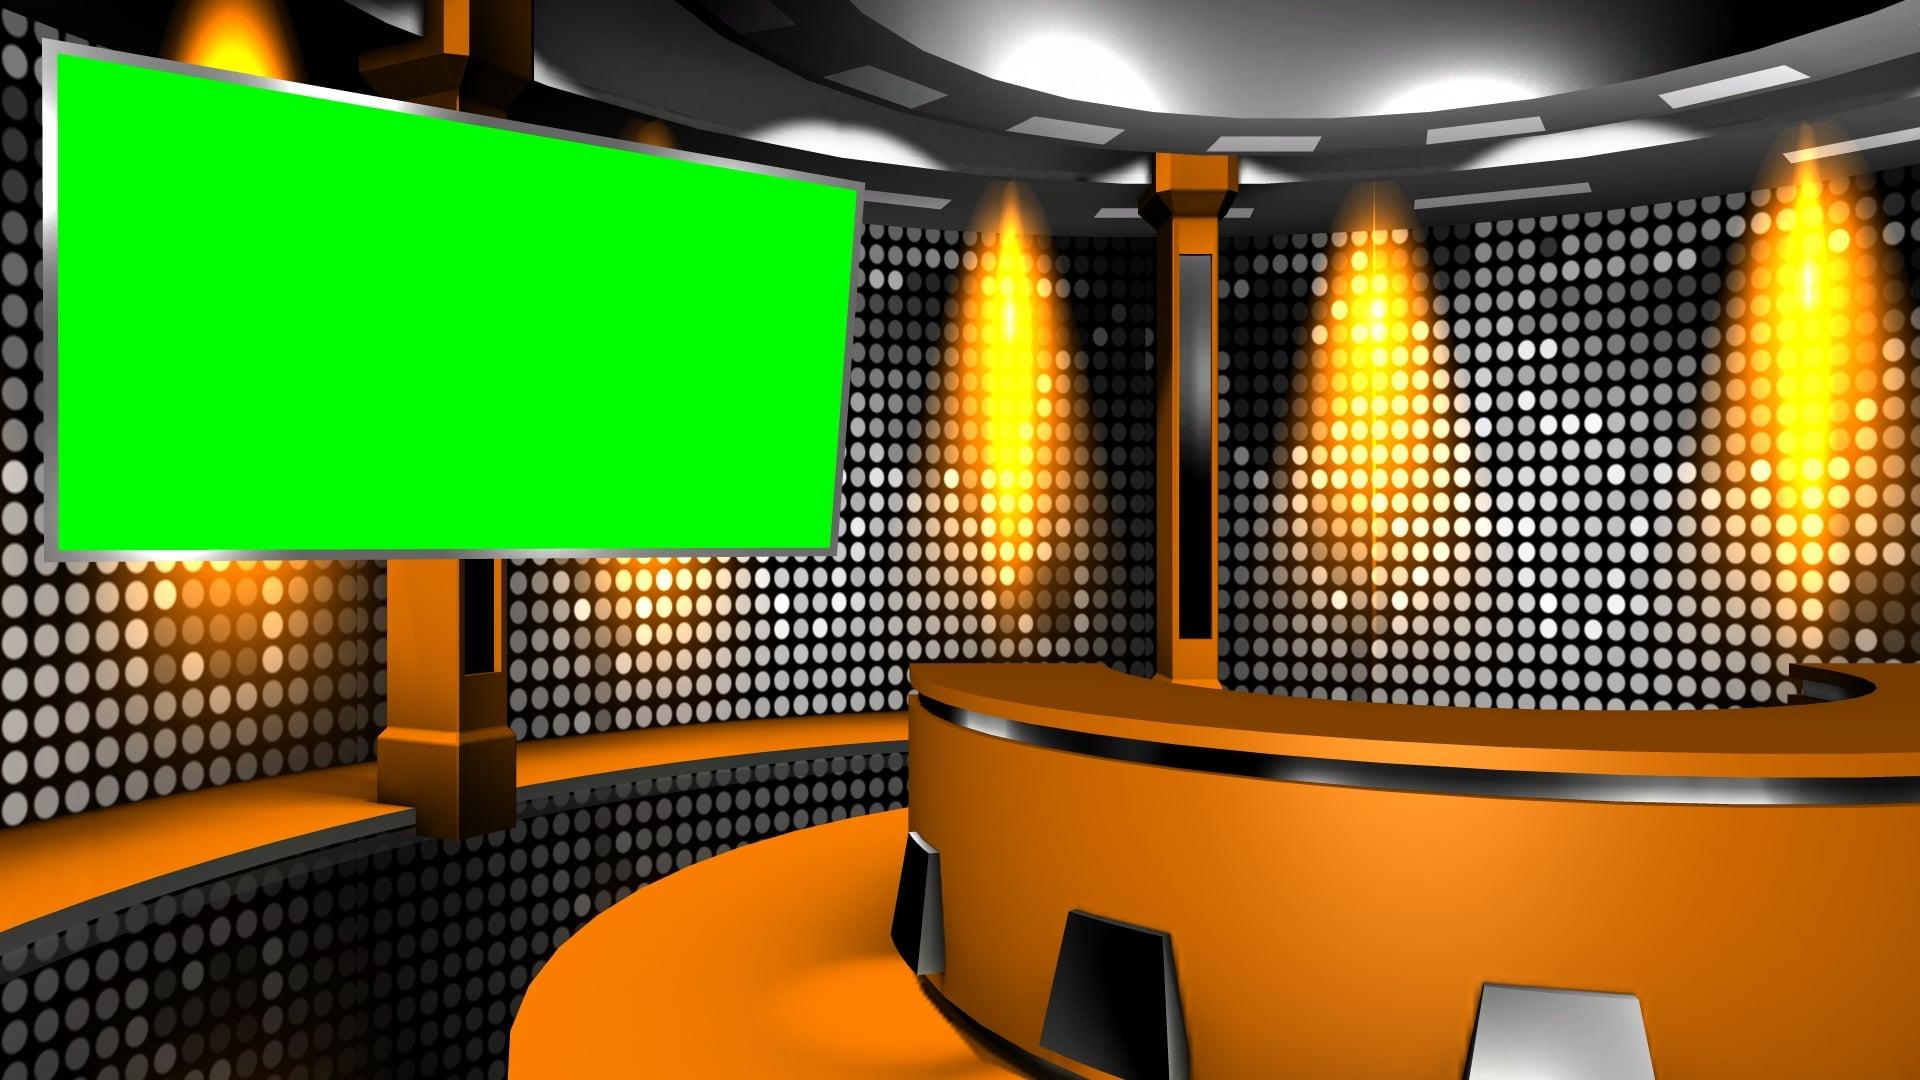 Tv Studio Background Free Download A Still Virtual Television Studio Background With Green Screen Free Video Footage a still virtual television studio